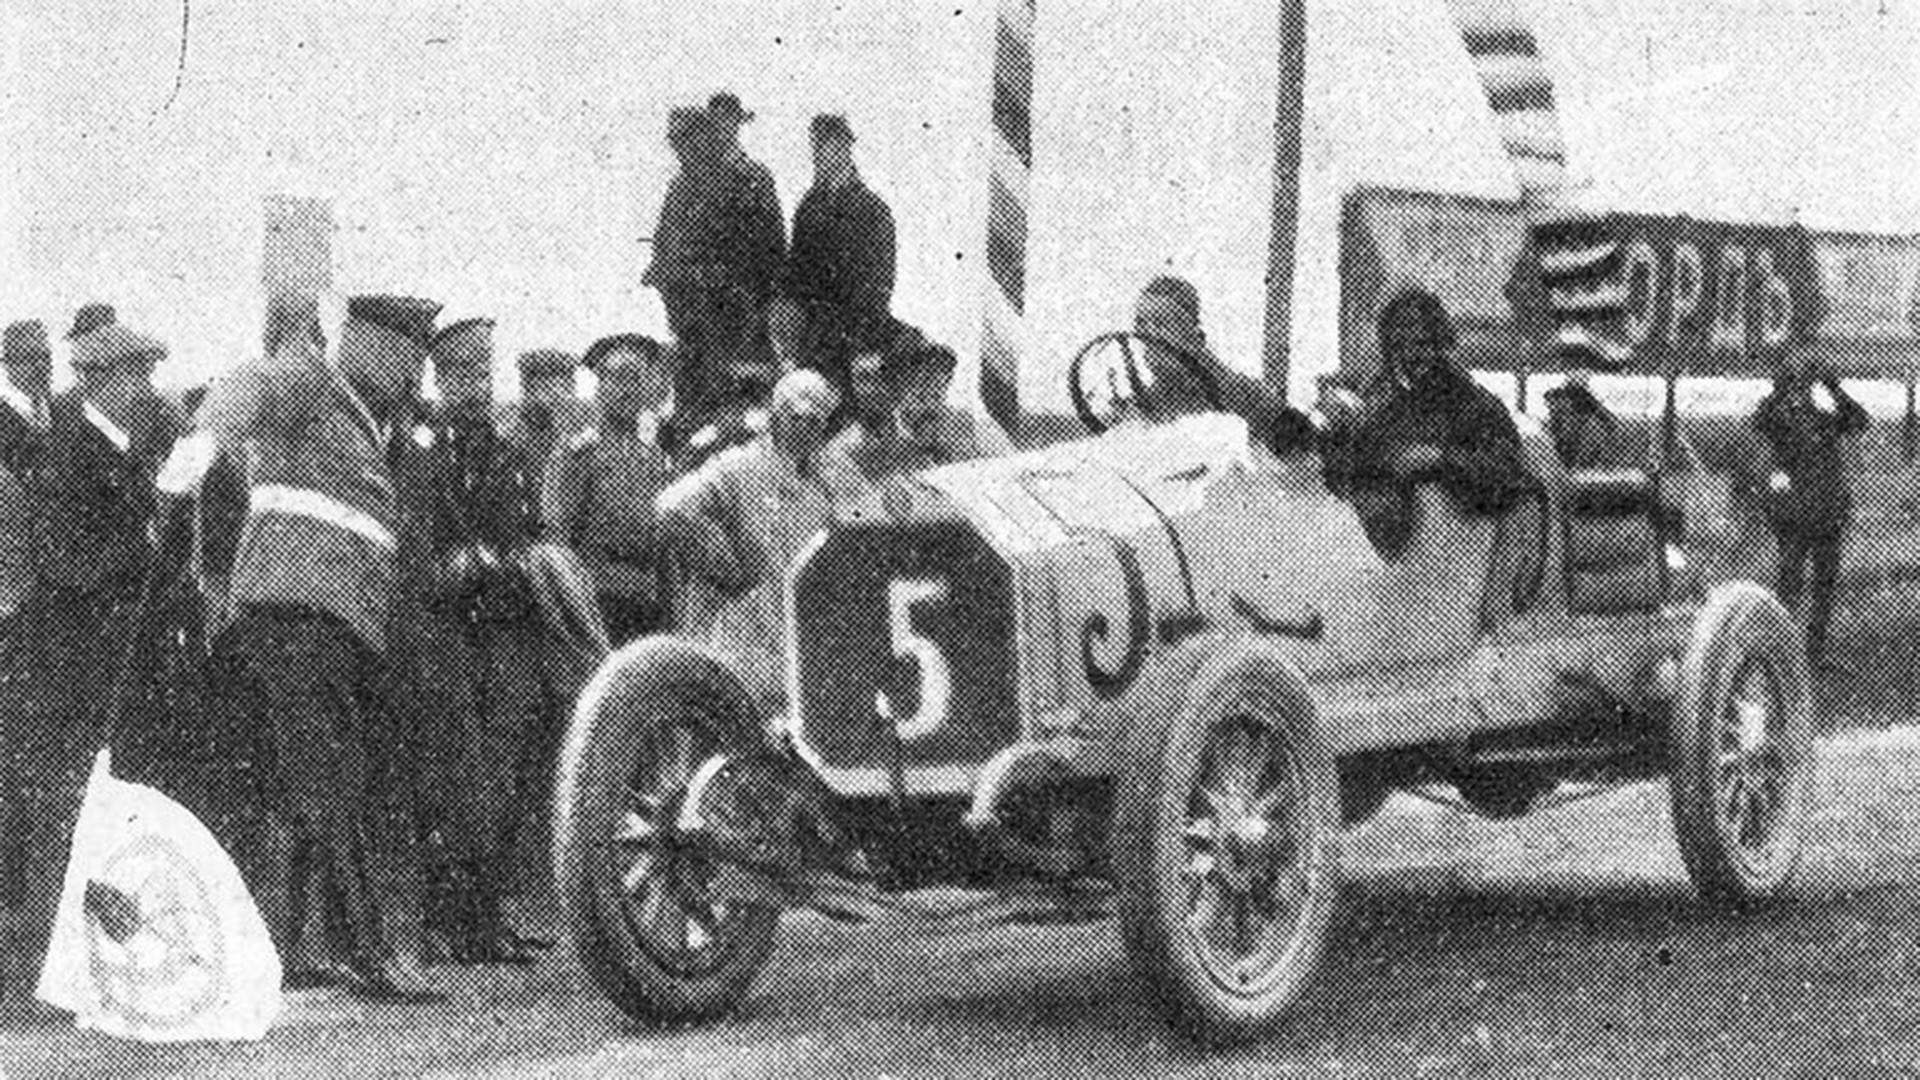 Grigory Suvorin melewati garis finis pada Grand Prix 1913.